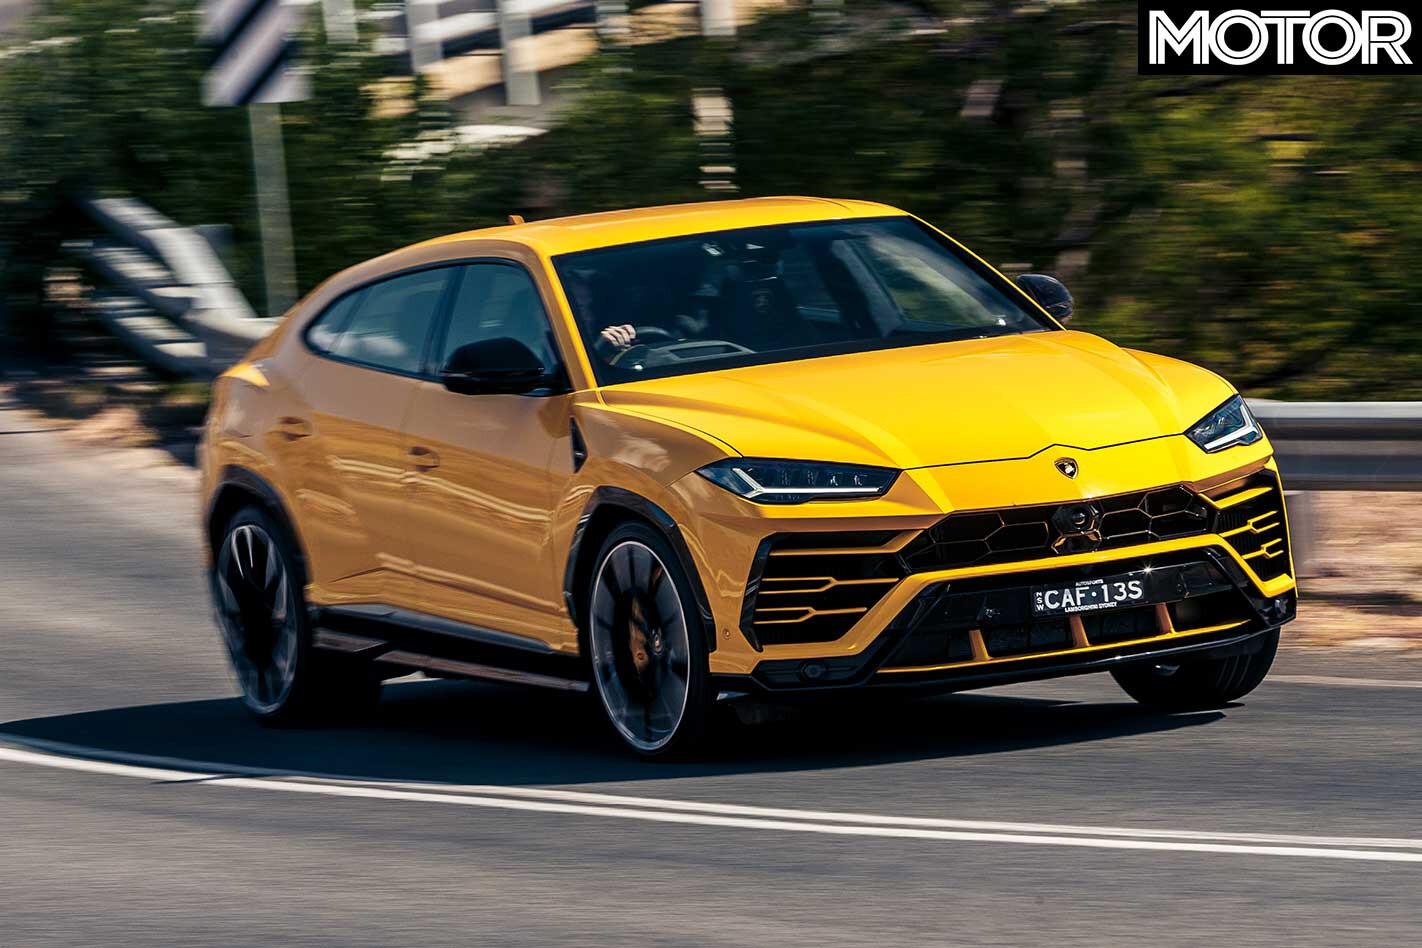 2019 Lamborghini Urus Cornering Jpg